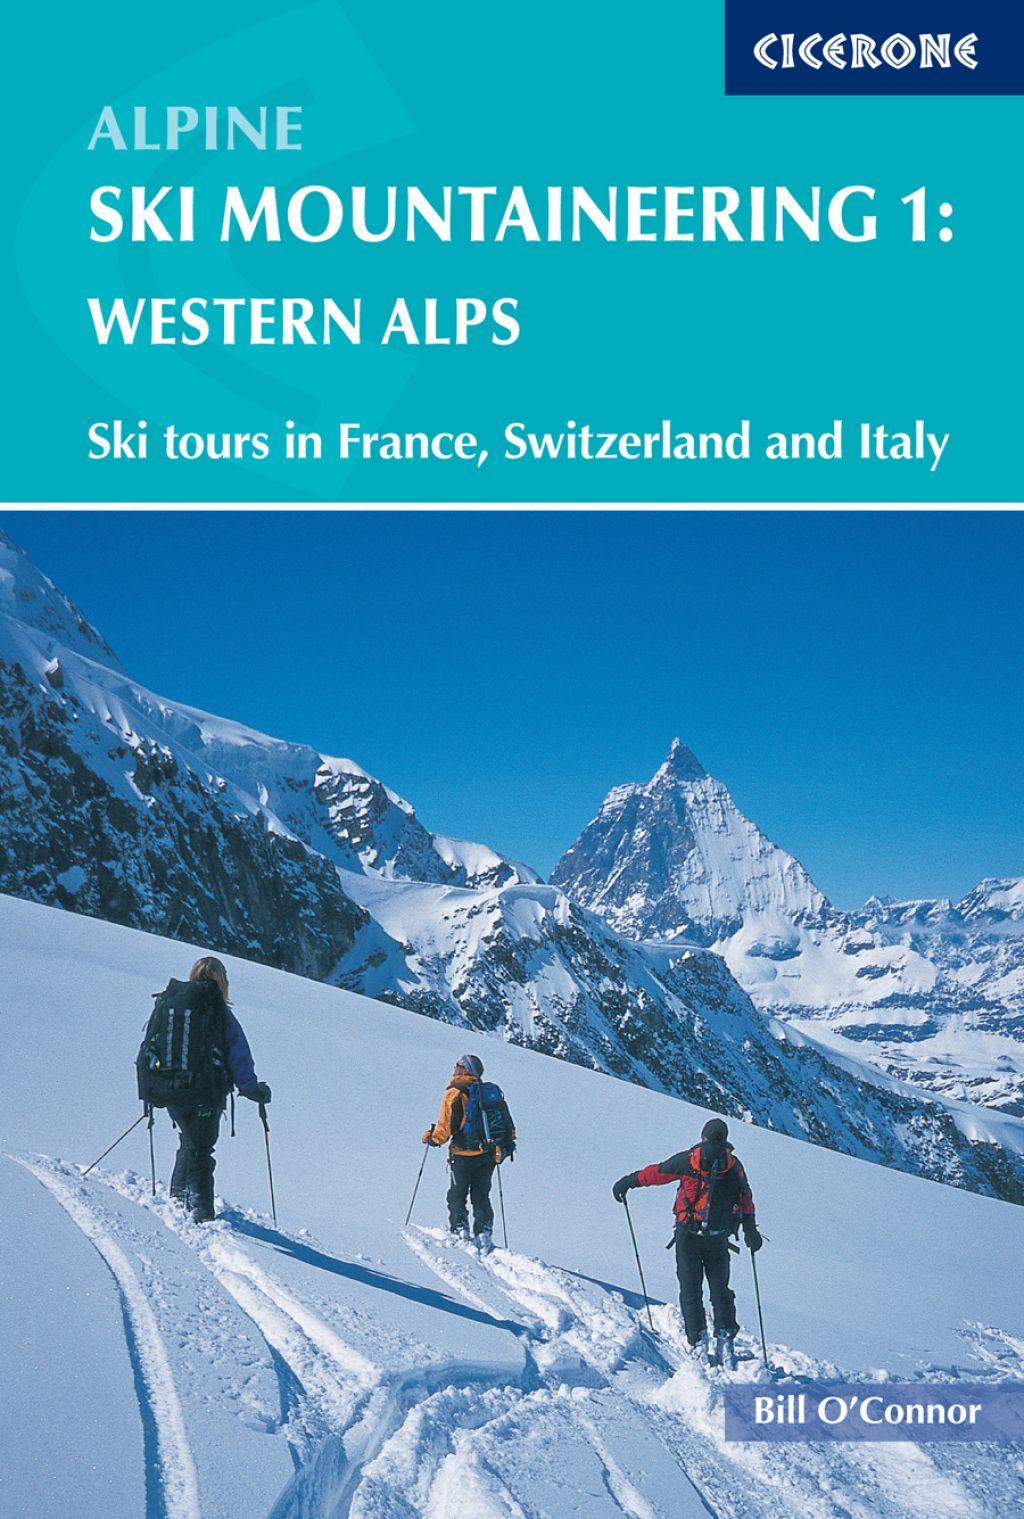 Alpine Ski Mountaineering Vol 1 Western Alps (eBook